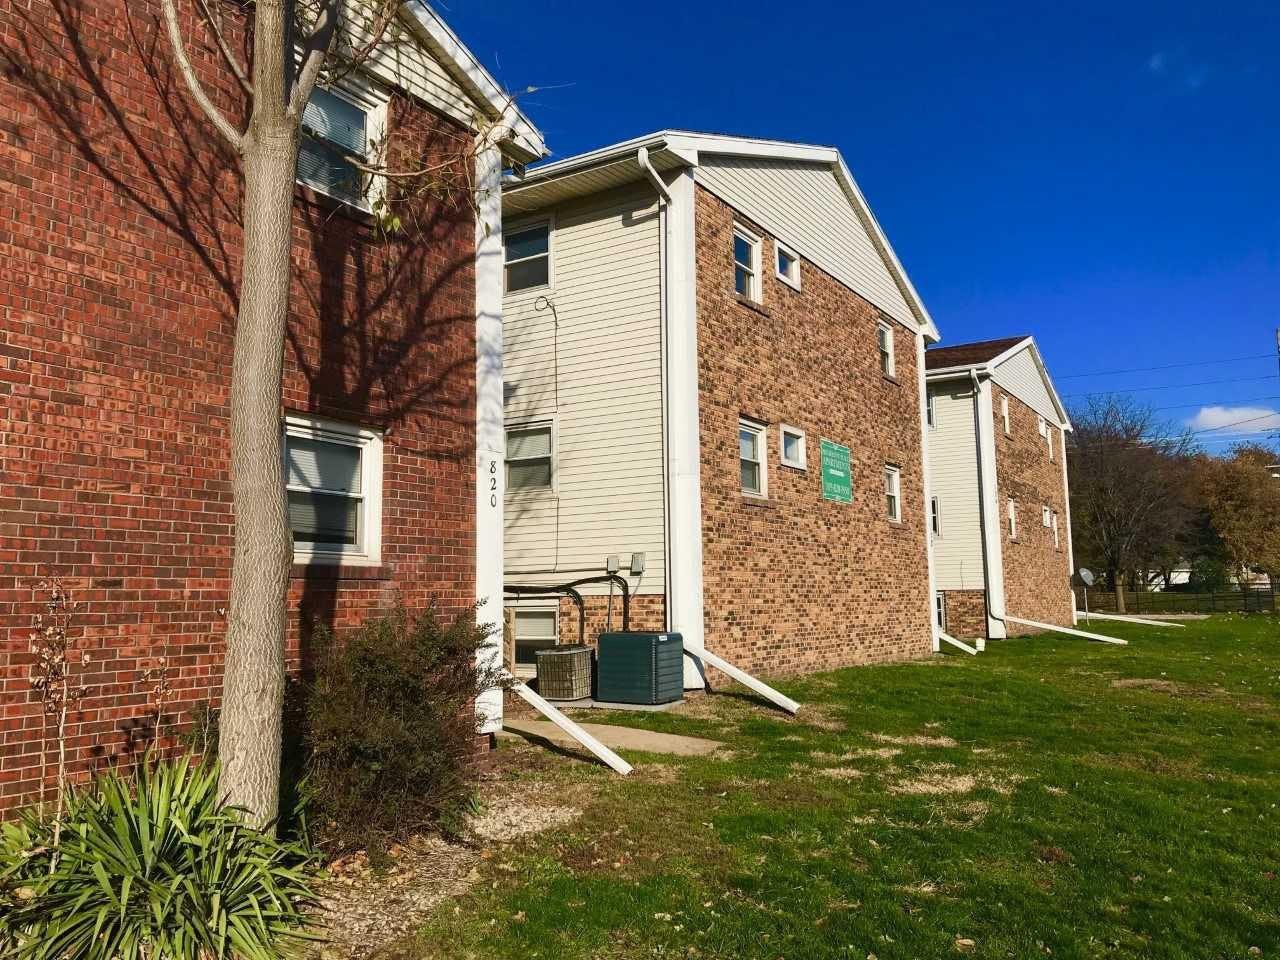 Apartments Near Illinois Wesleyan 820 E Washington St. for Illinois Wesleyan University Students in Bloomington, IL